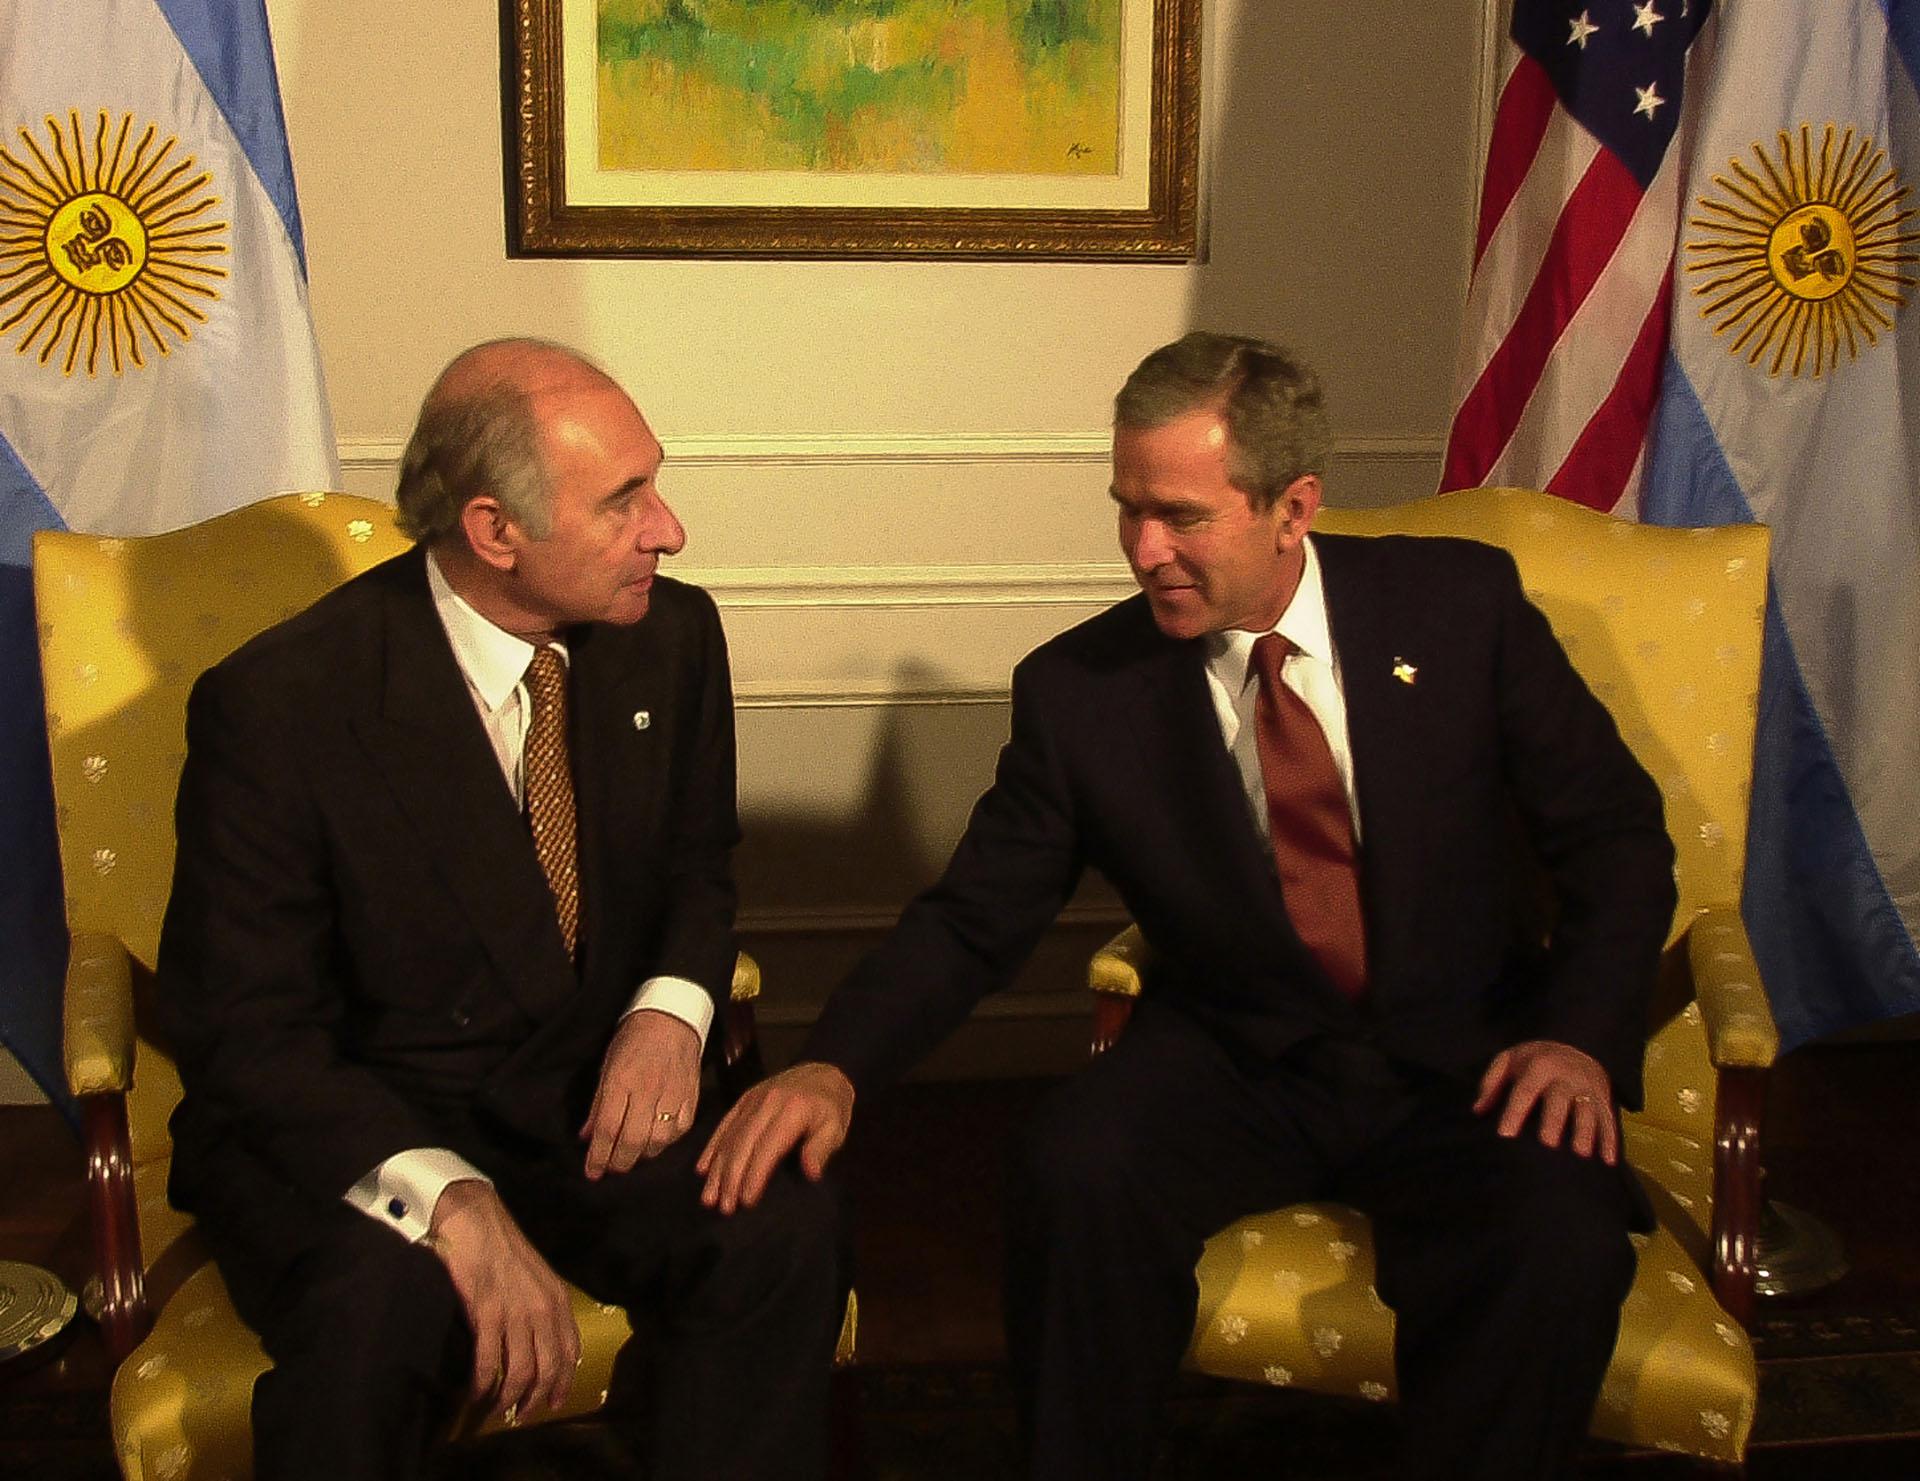 George Bush posa la mano sobre la rodilla de De la Rúa